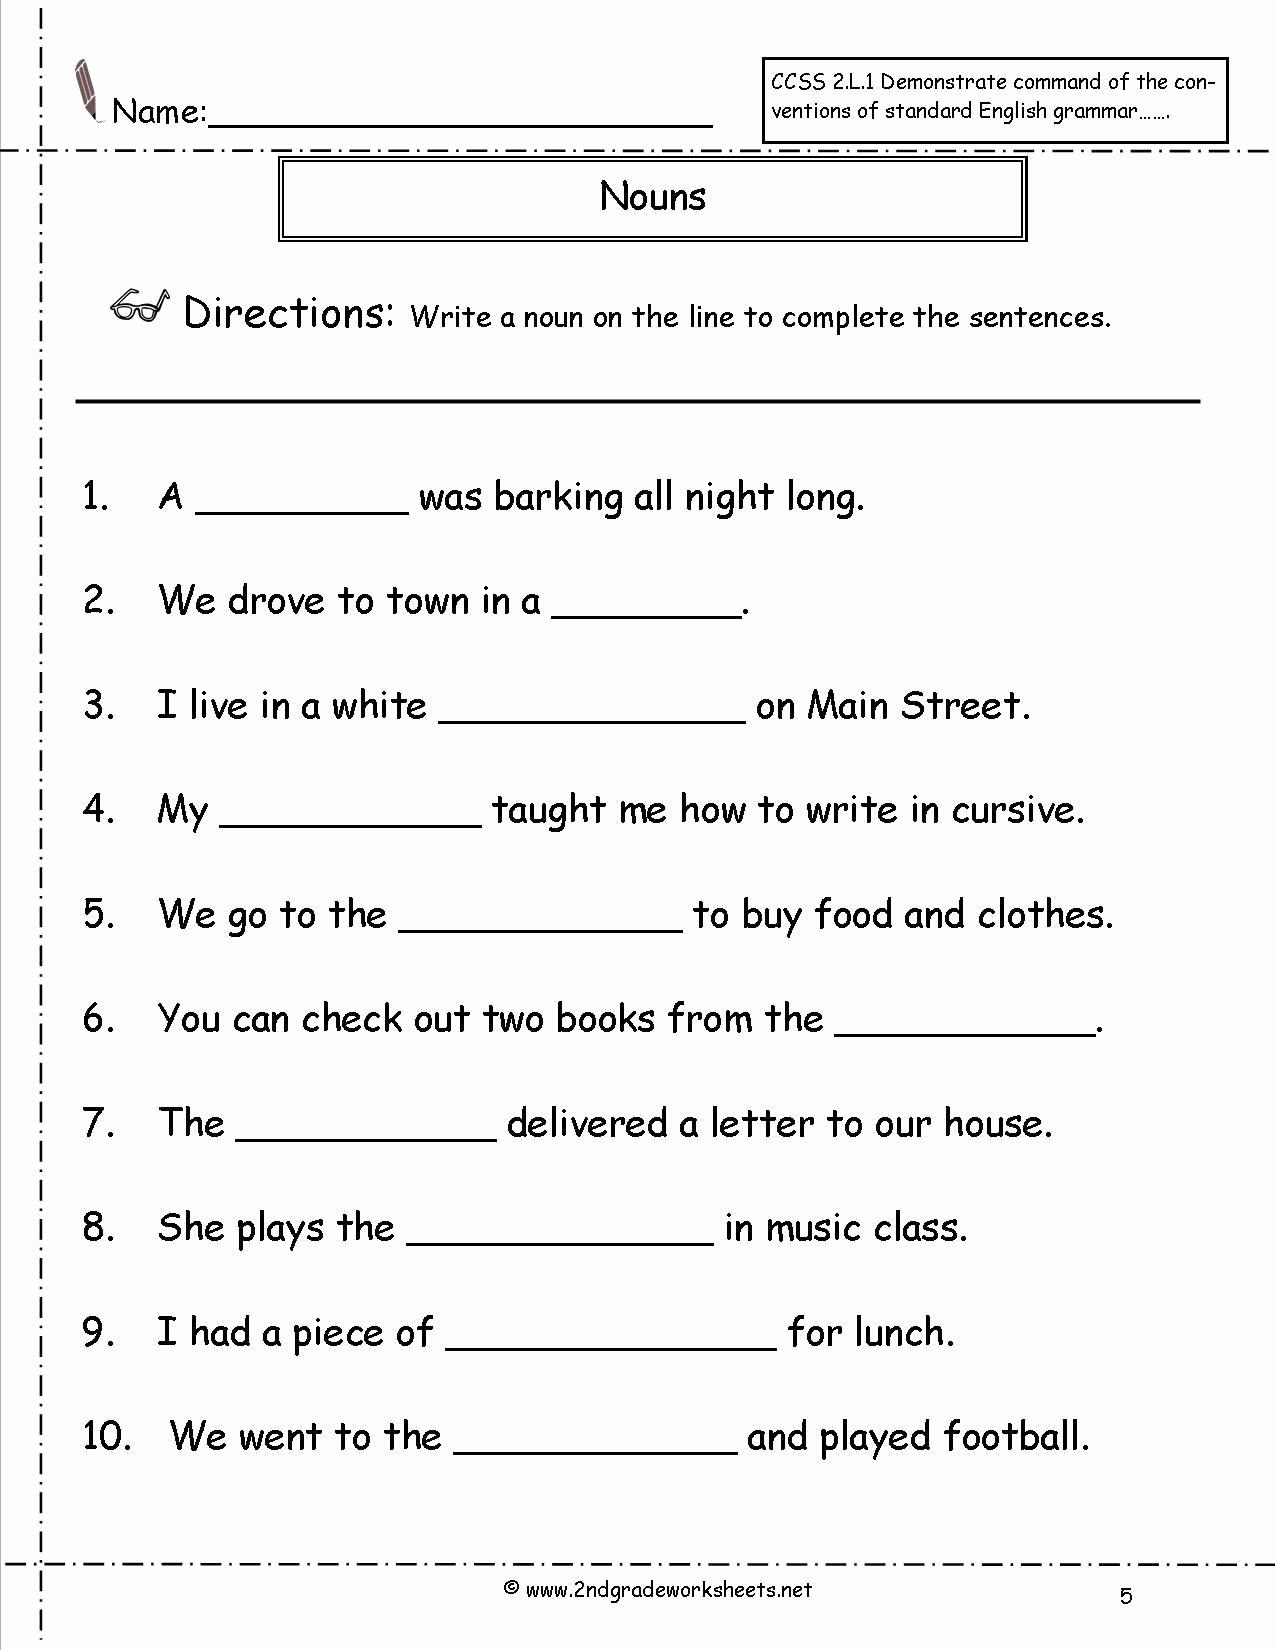 Homonyms Worksheets 5th Grade New Homophones Worksheet 5th Grade